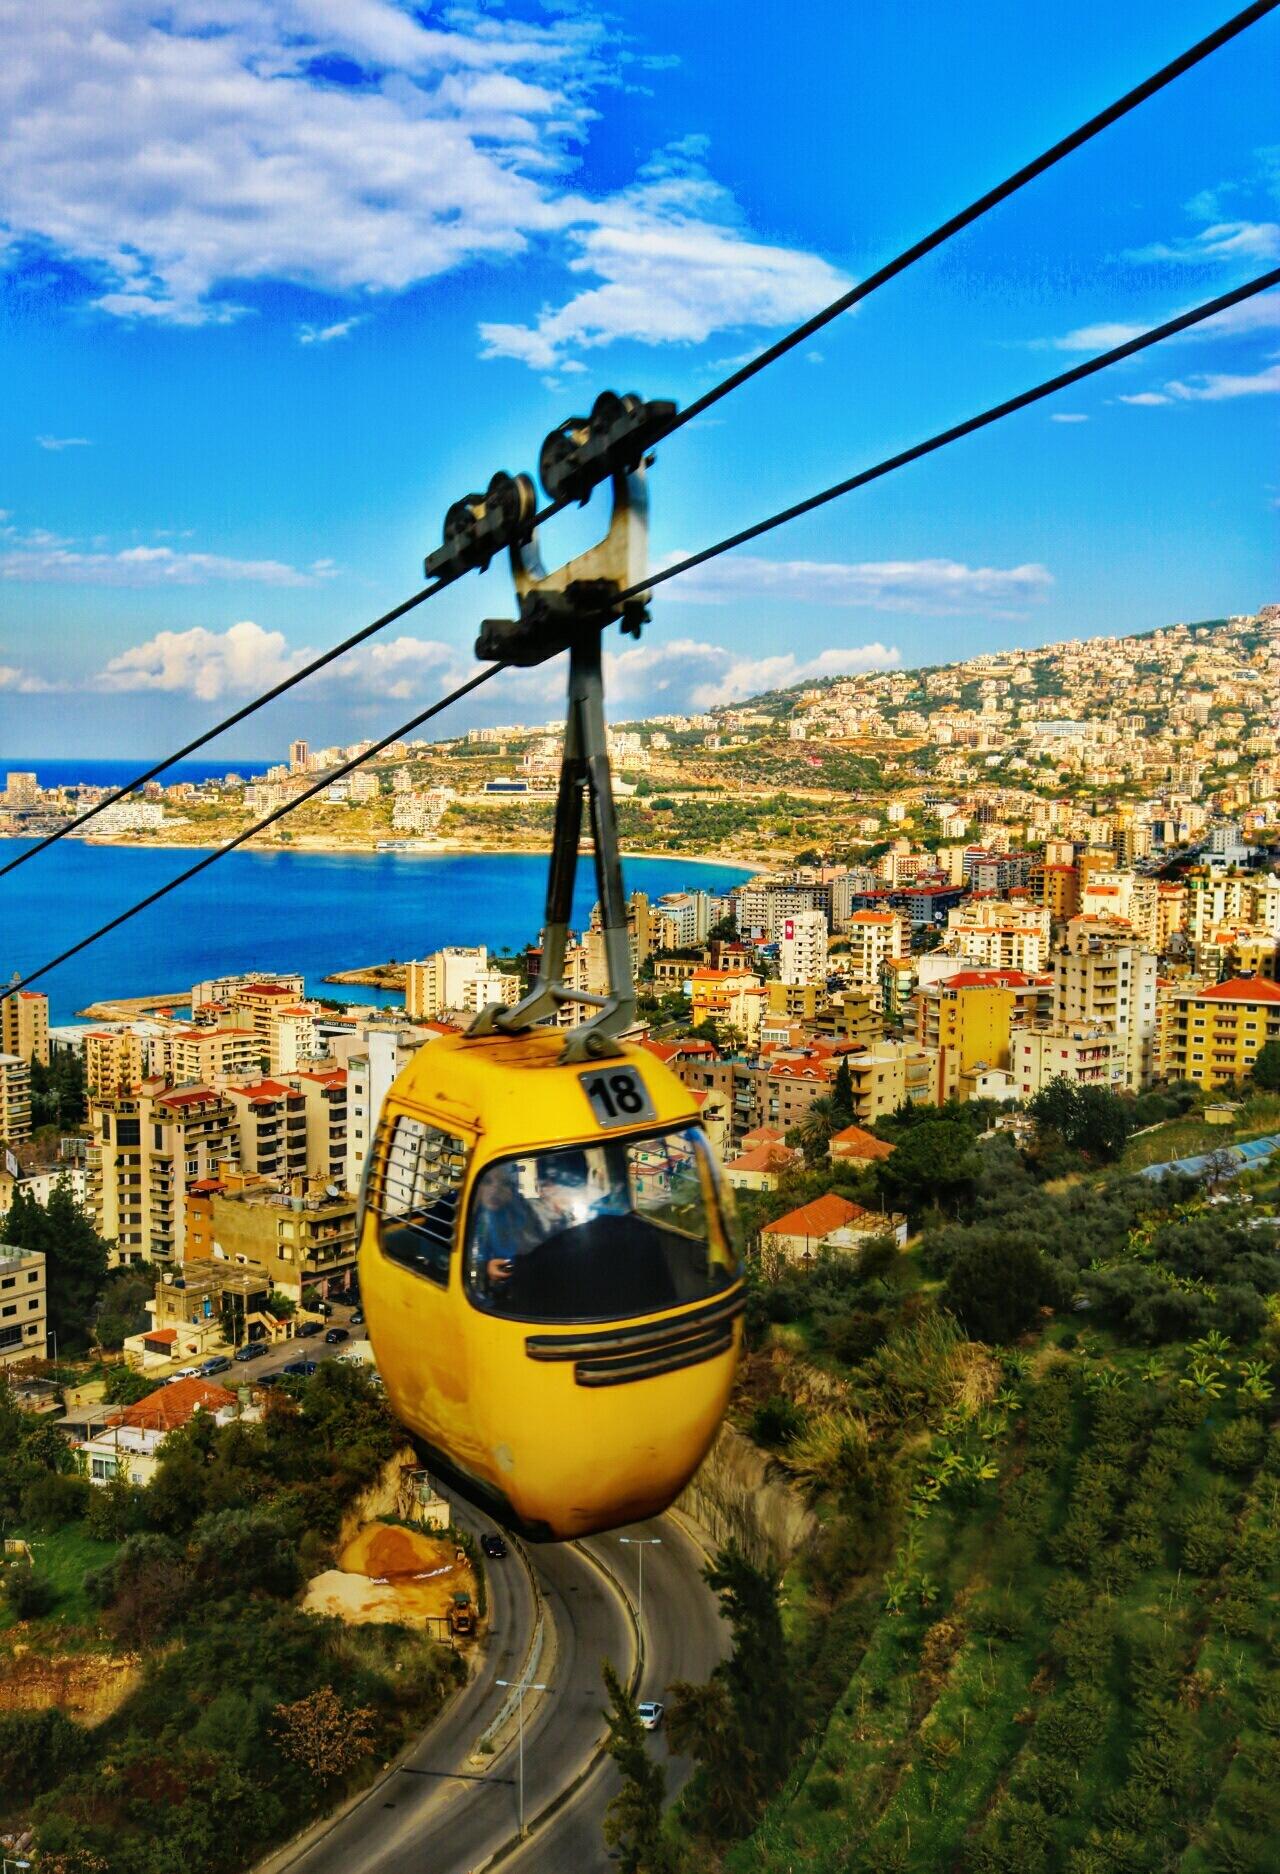 telefrique lebanon by Sarah Alloush